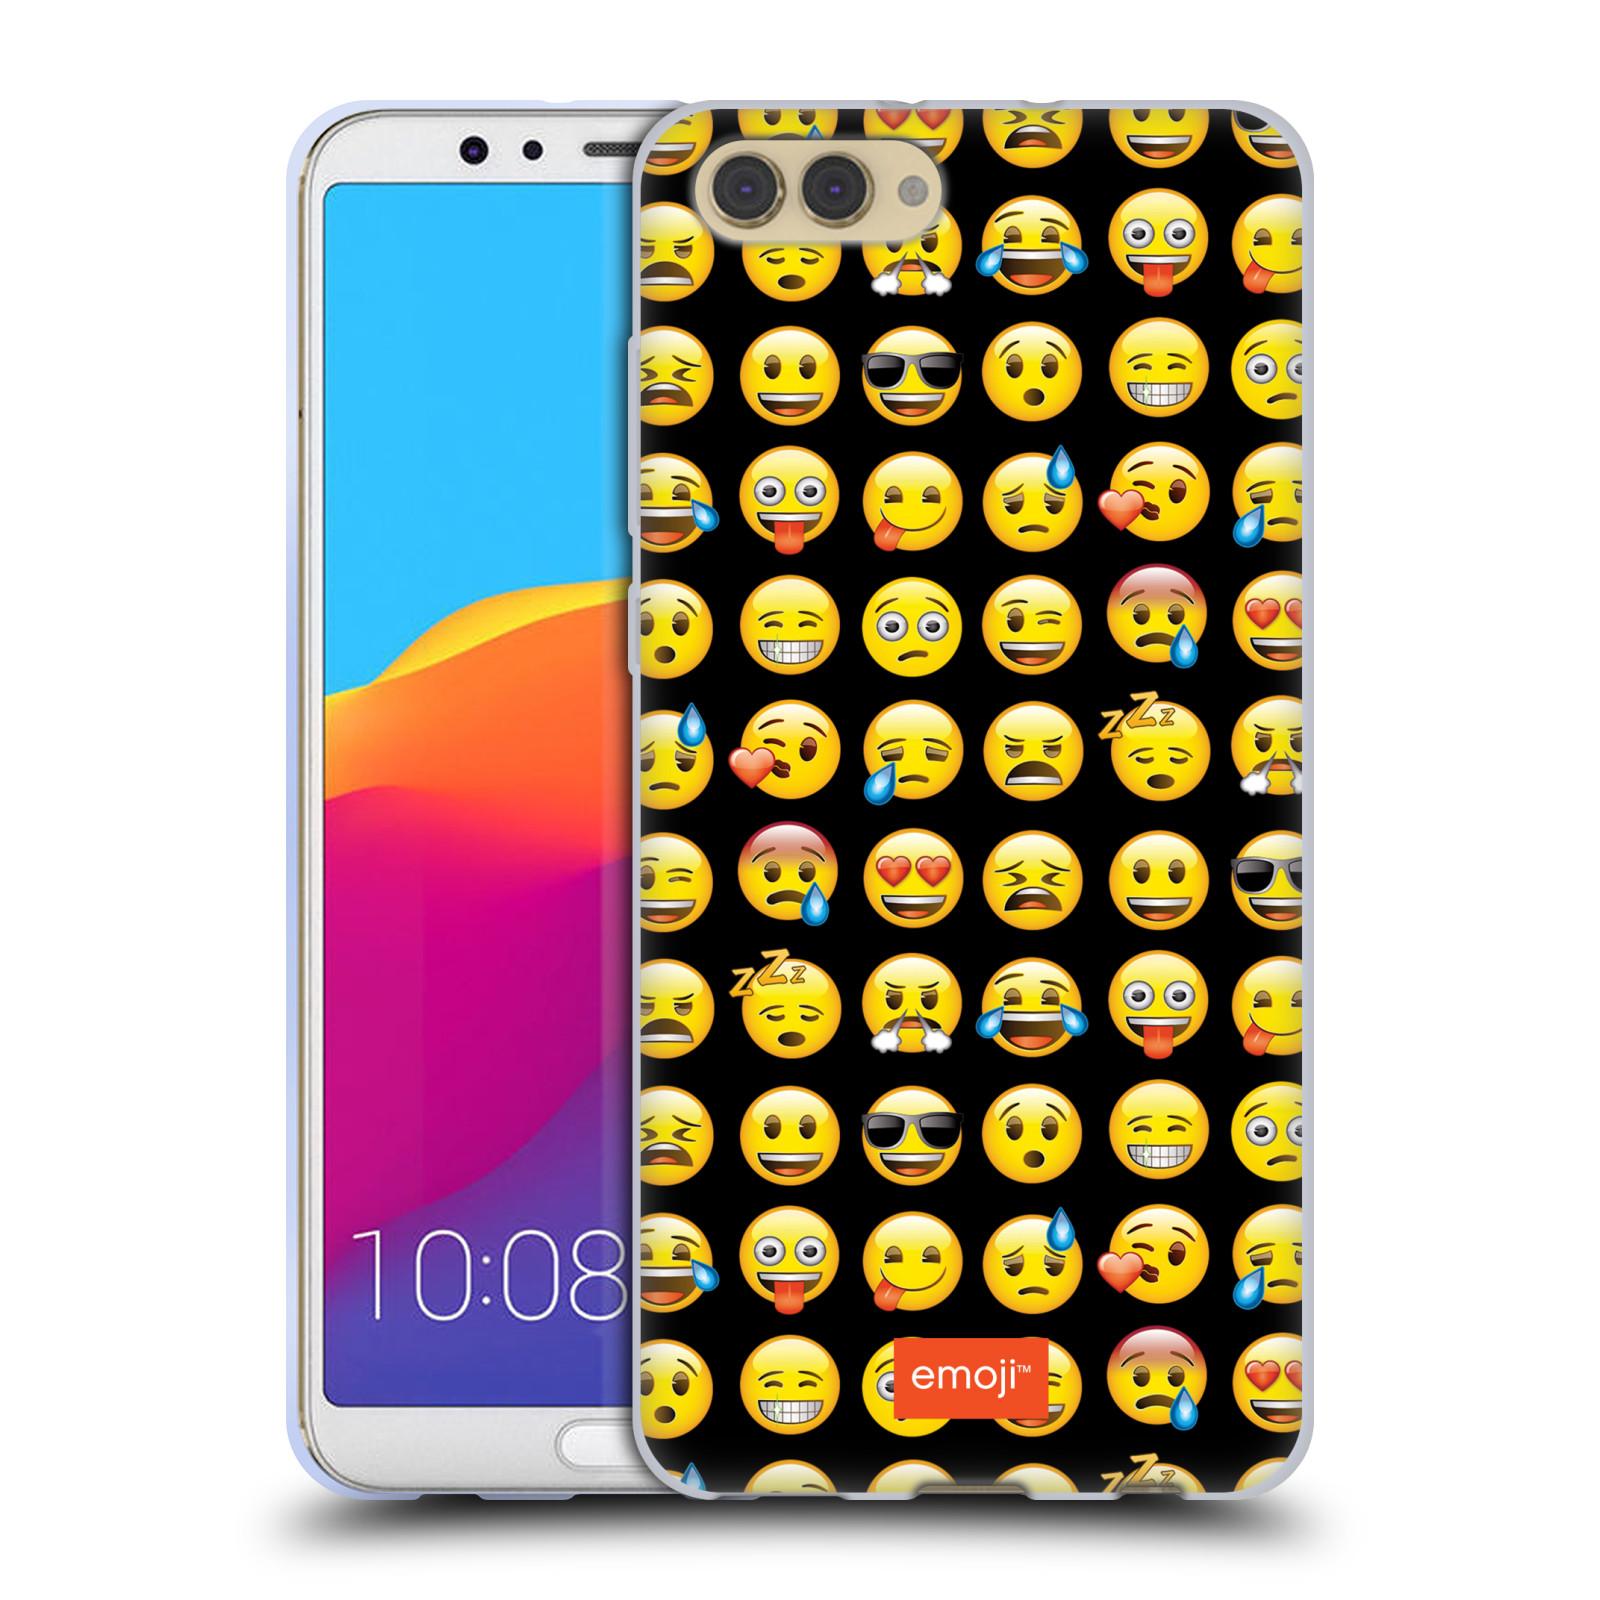 HEAD CASE silikonový obal na mobil Huawei HONOR VIEW 10 / V10 smajlík oficiální kryt EMOJI černé pozadí klasičtí smajlíci